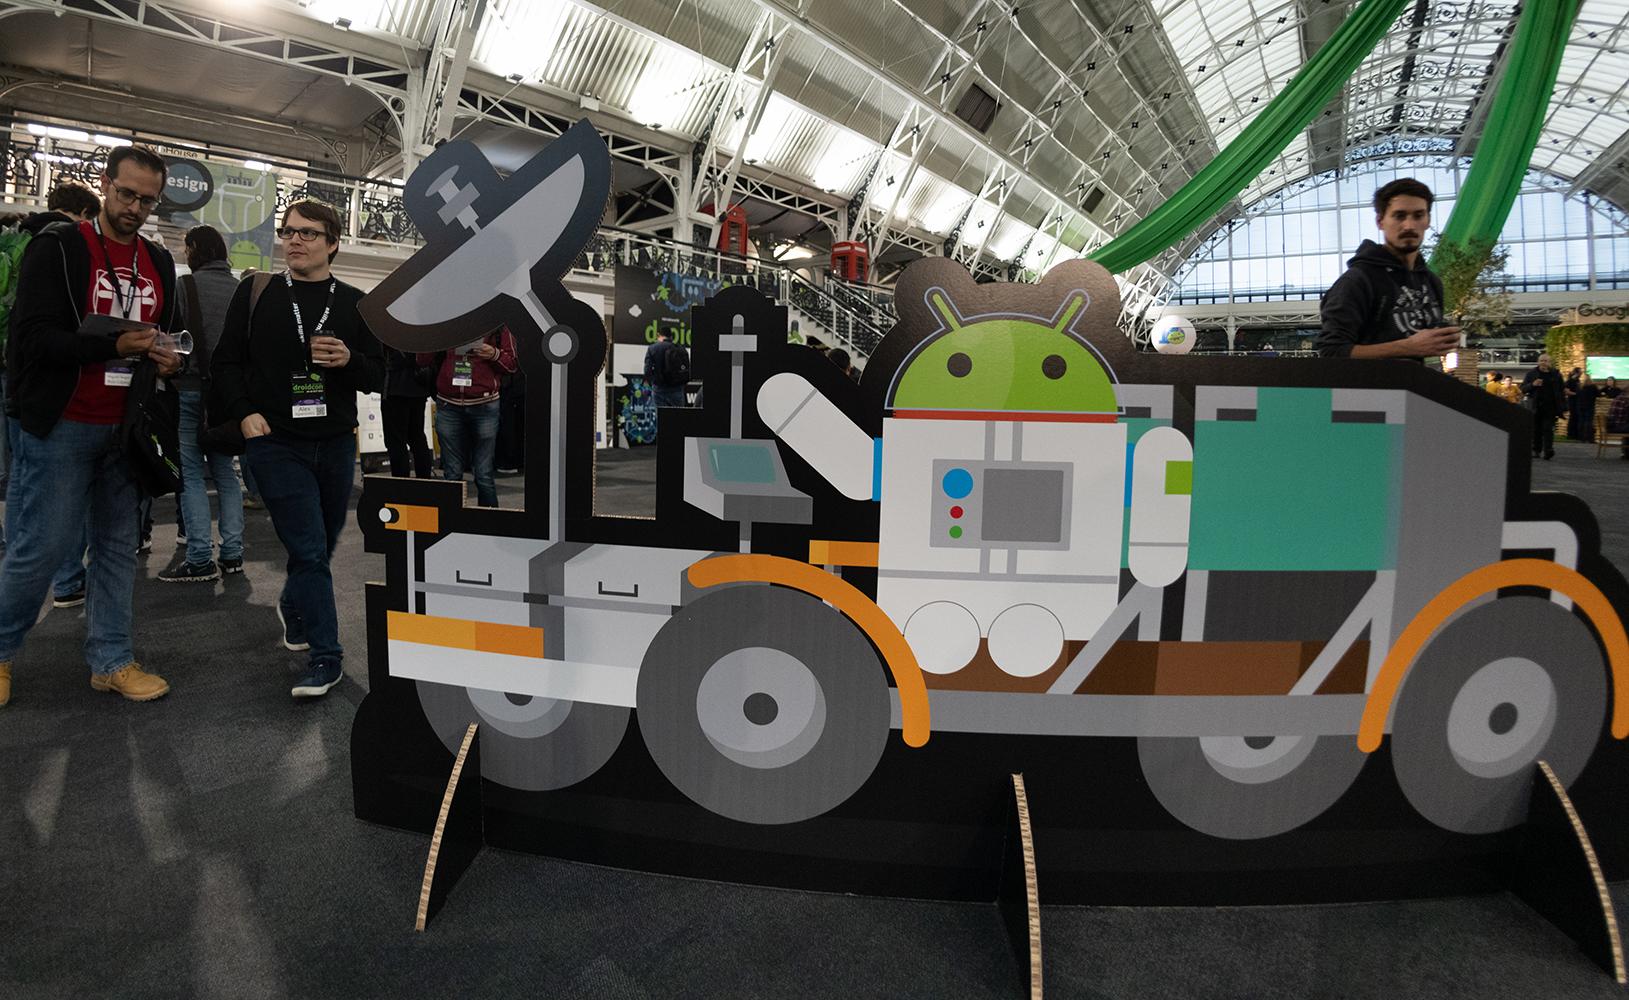 droidcon-Ldn-2019-slideshow-rover_stande